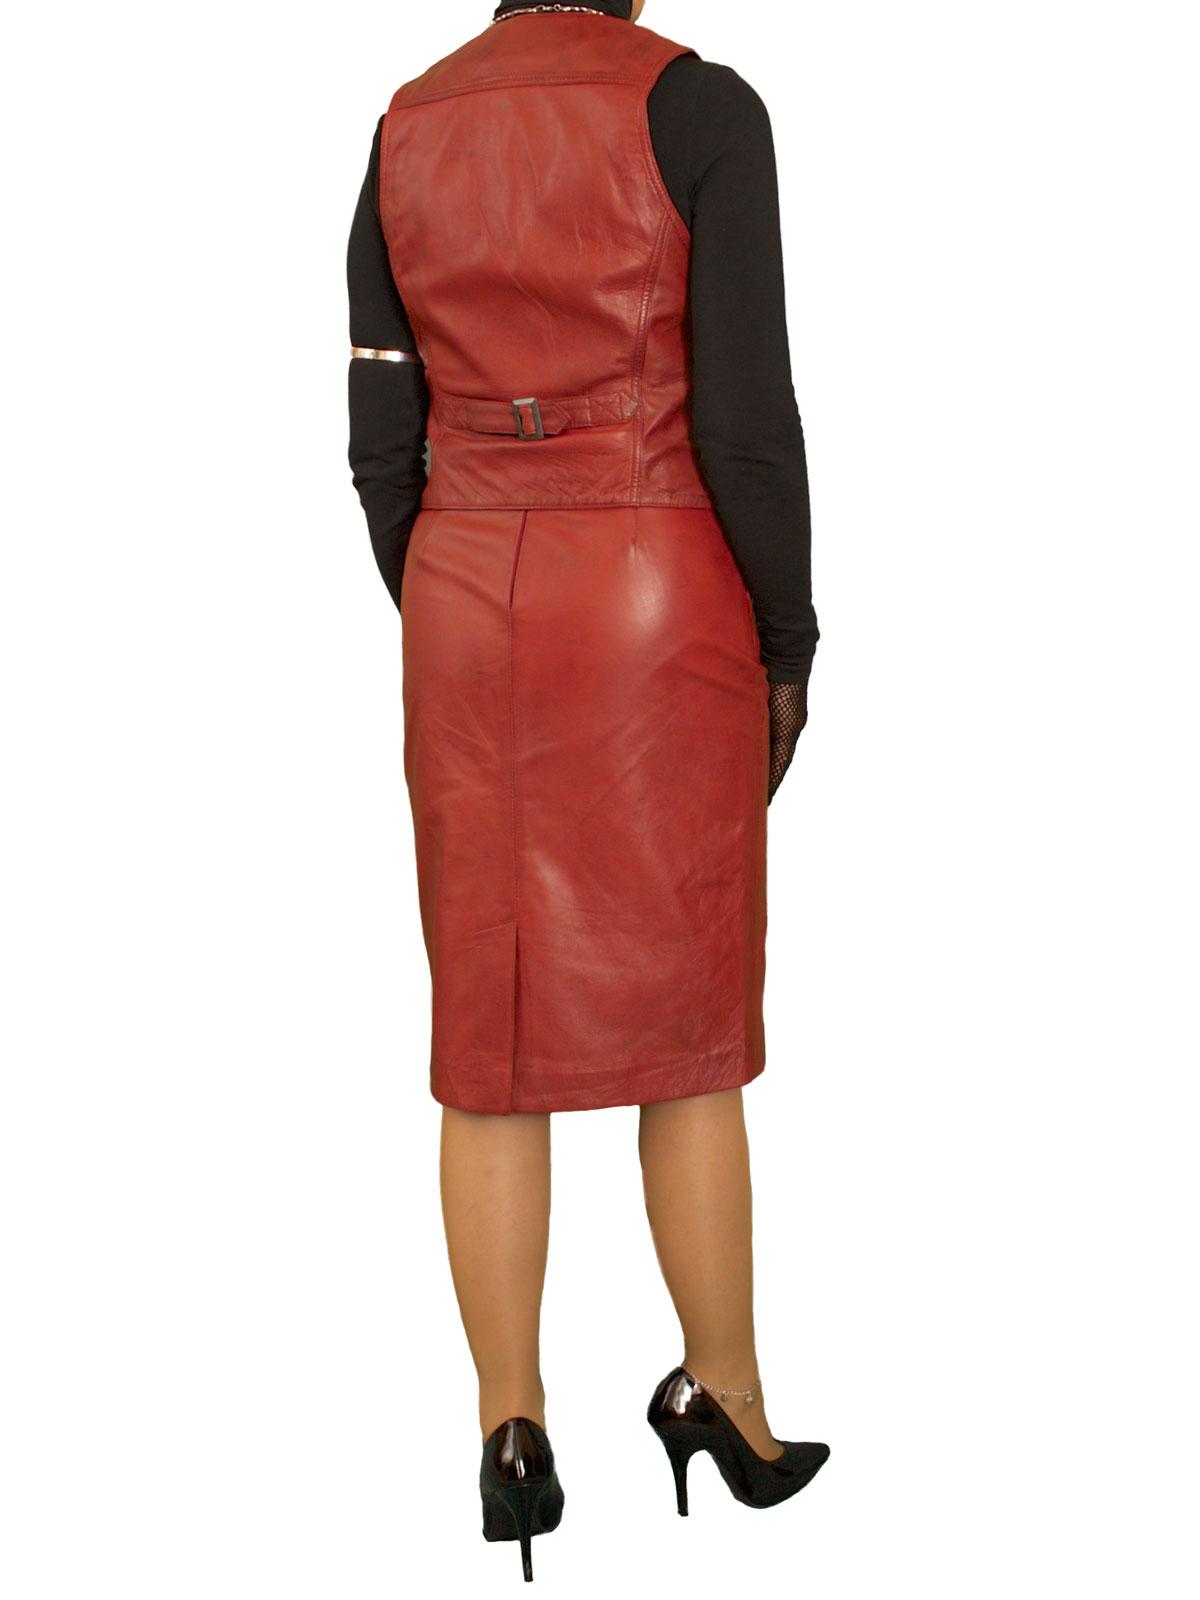 Womens Leather Outfit Pencil Skirt Waistcoat Tout Ensemble